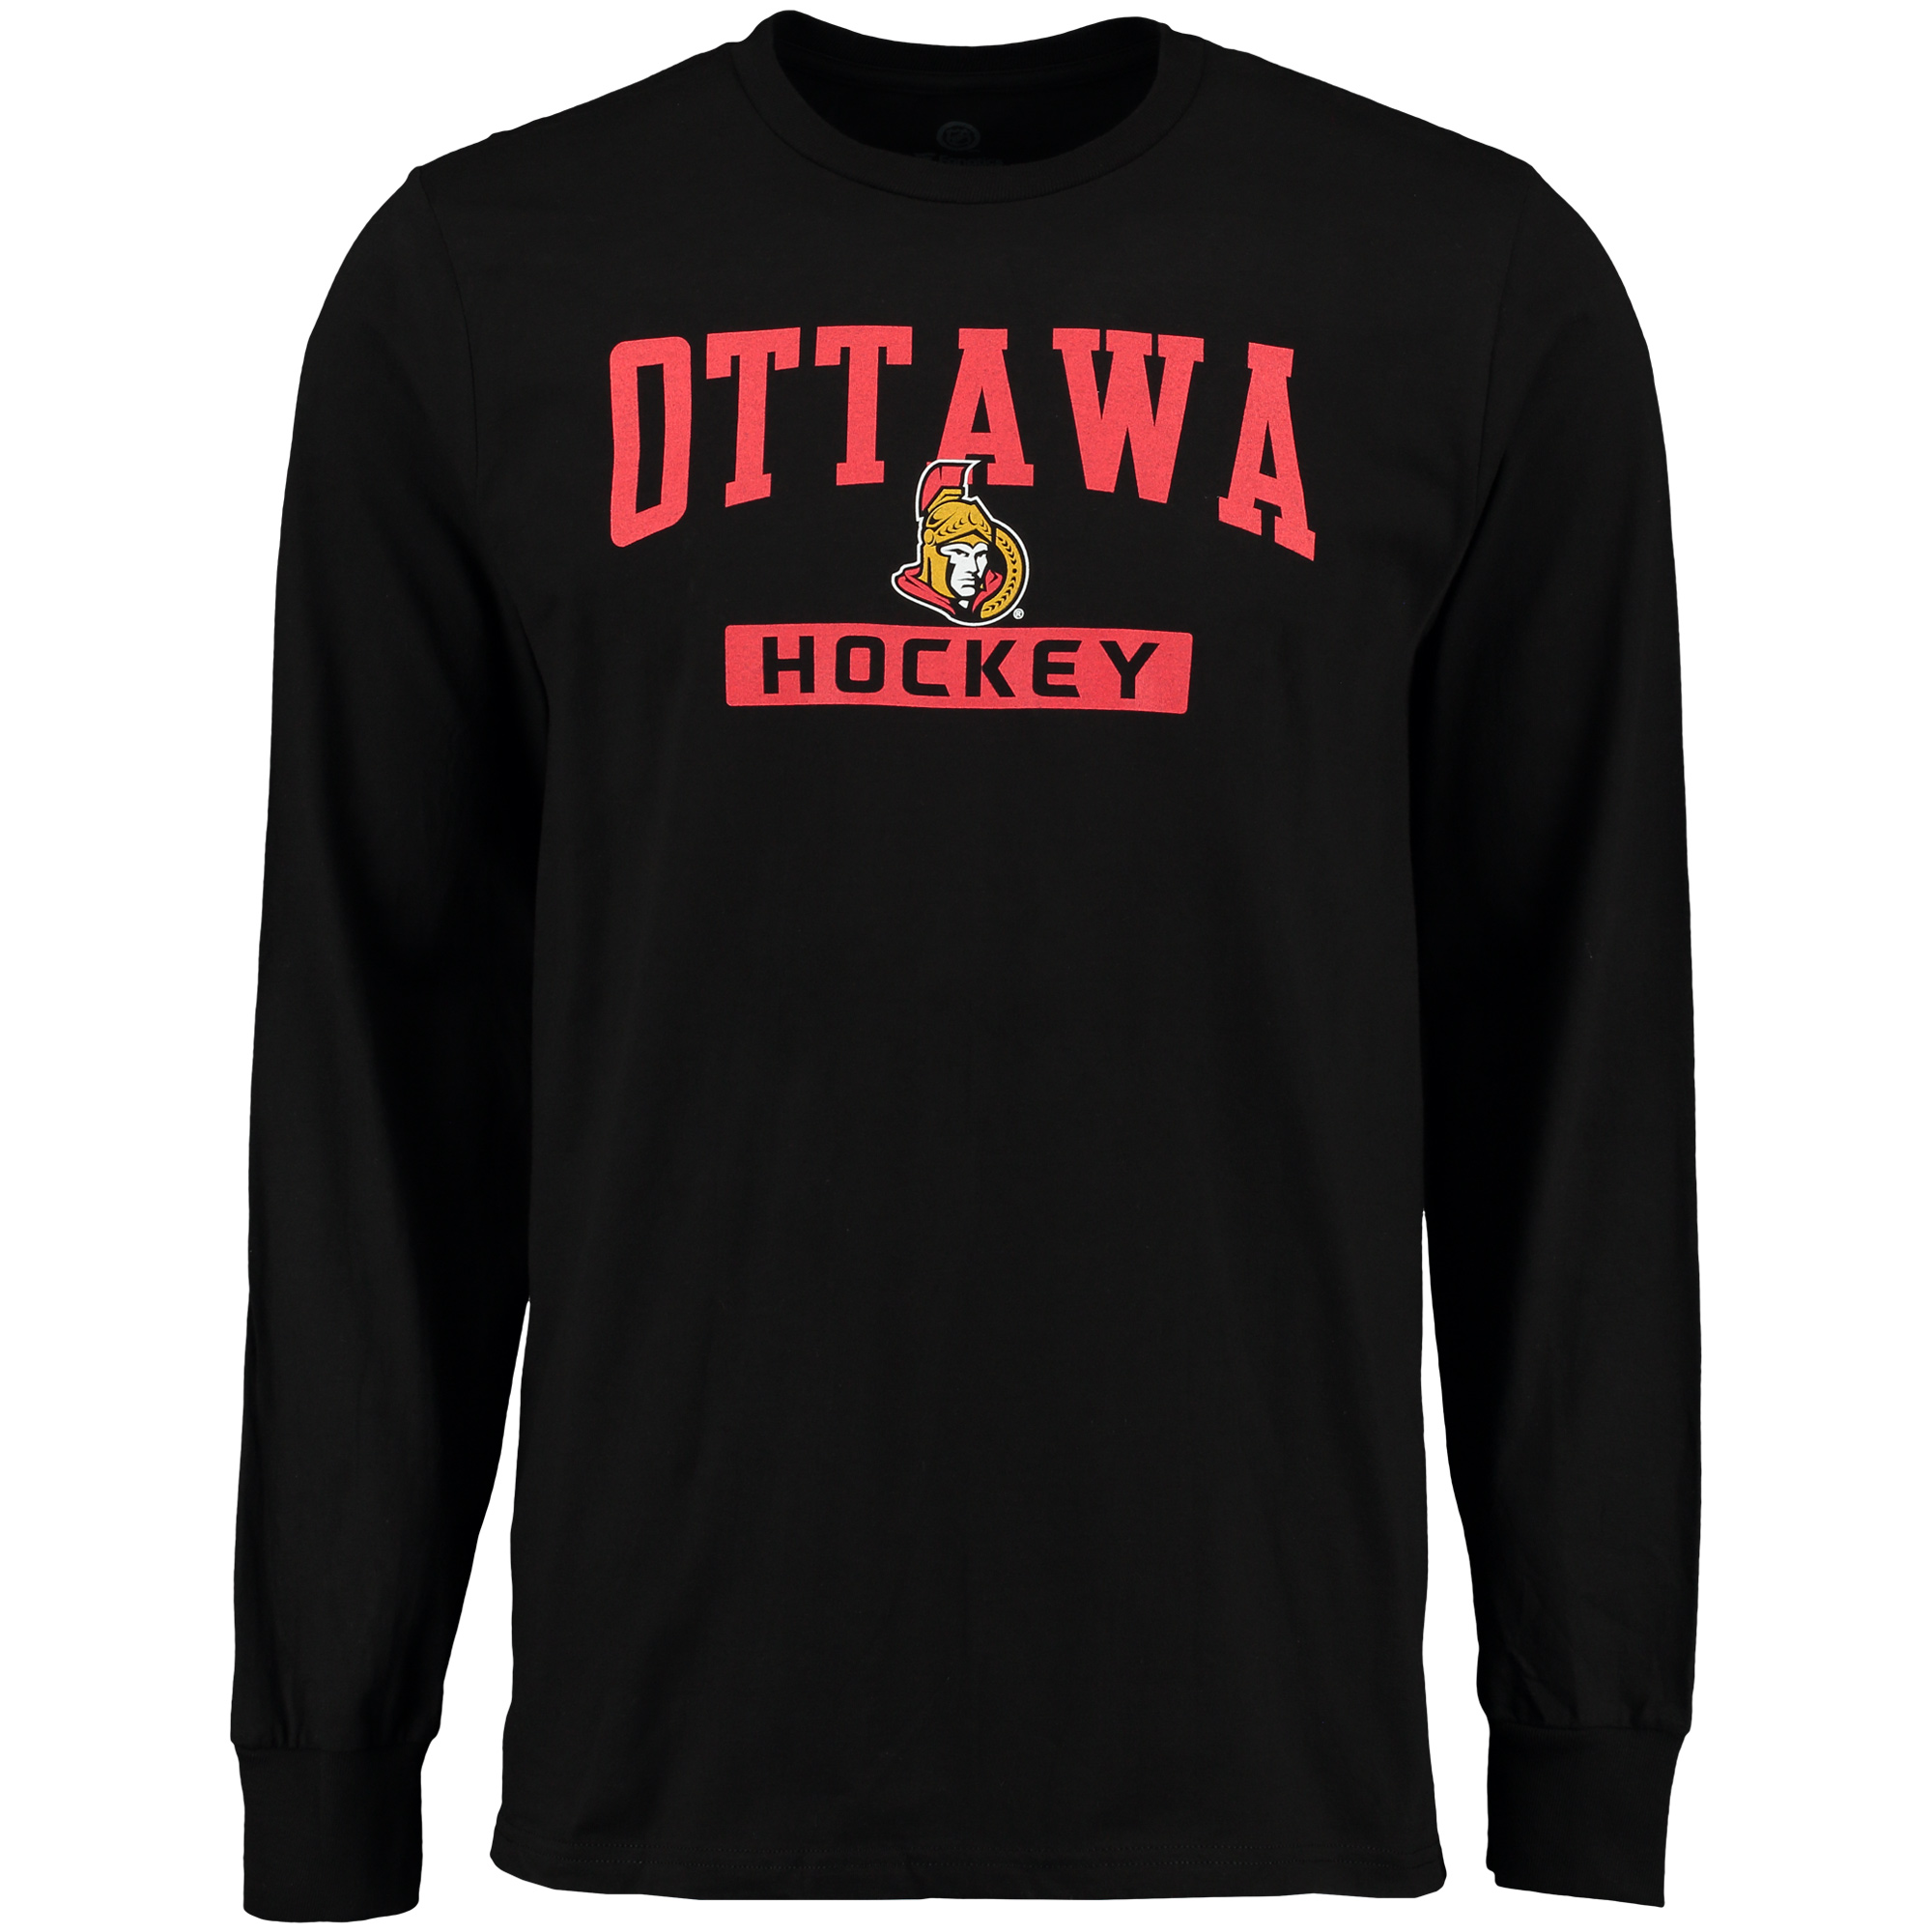 Ottawa Senators Rinkside City Pride Long Sleeve T-Shirt - Black